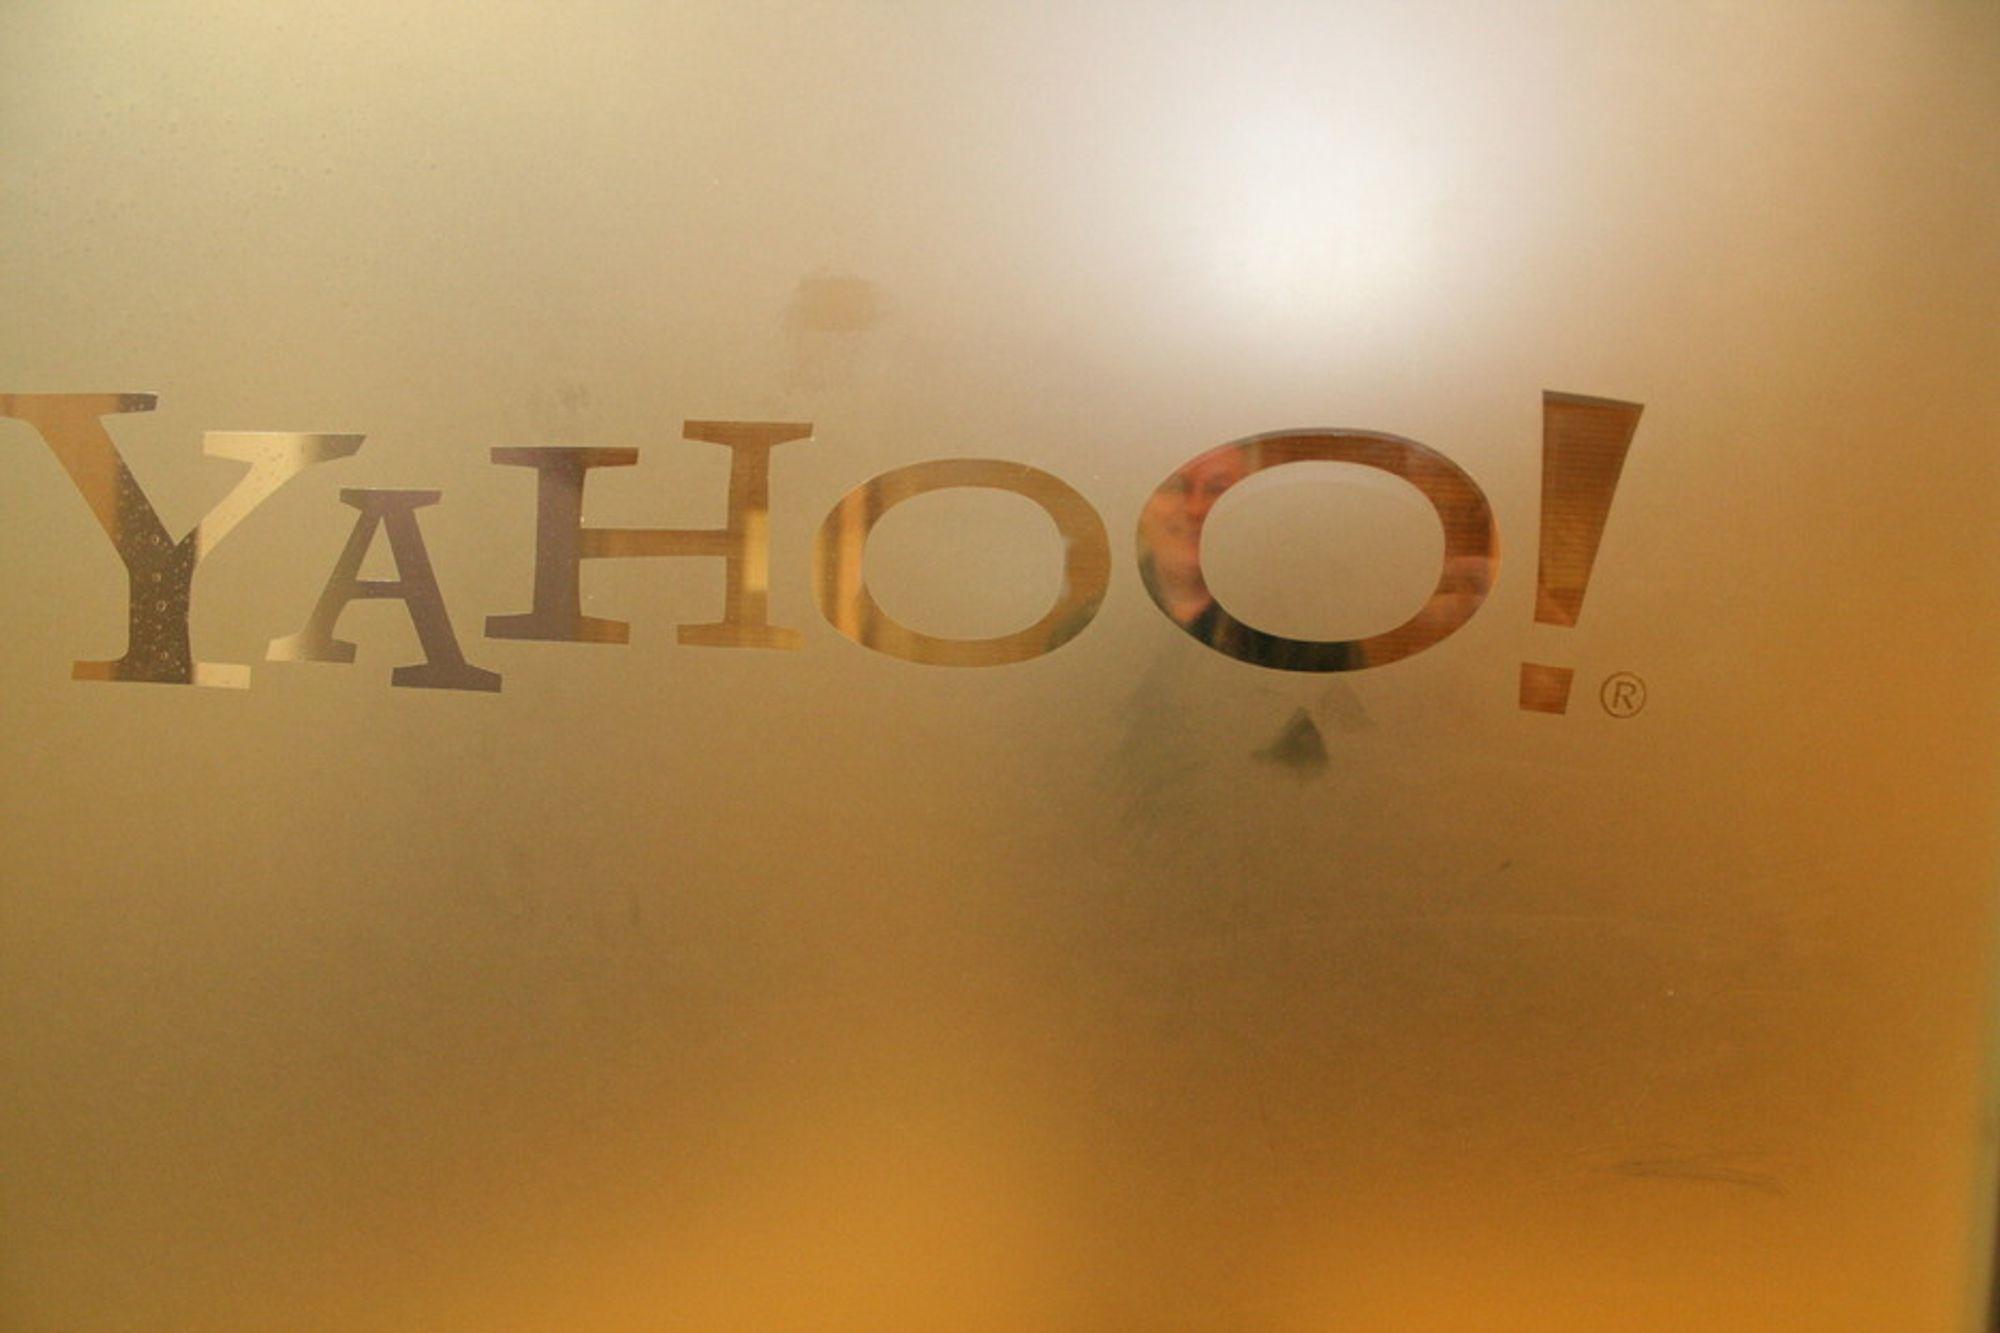 Yahoo, døra til Trondheimskontoret